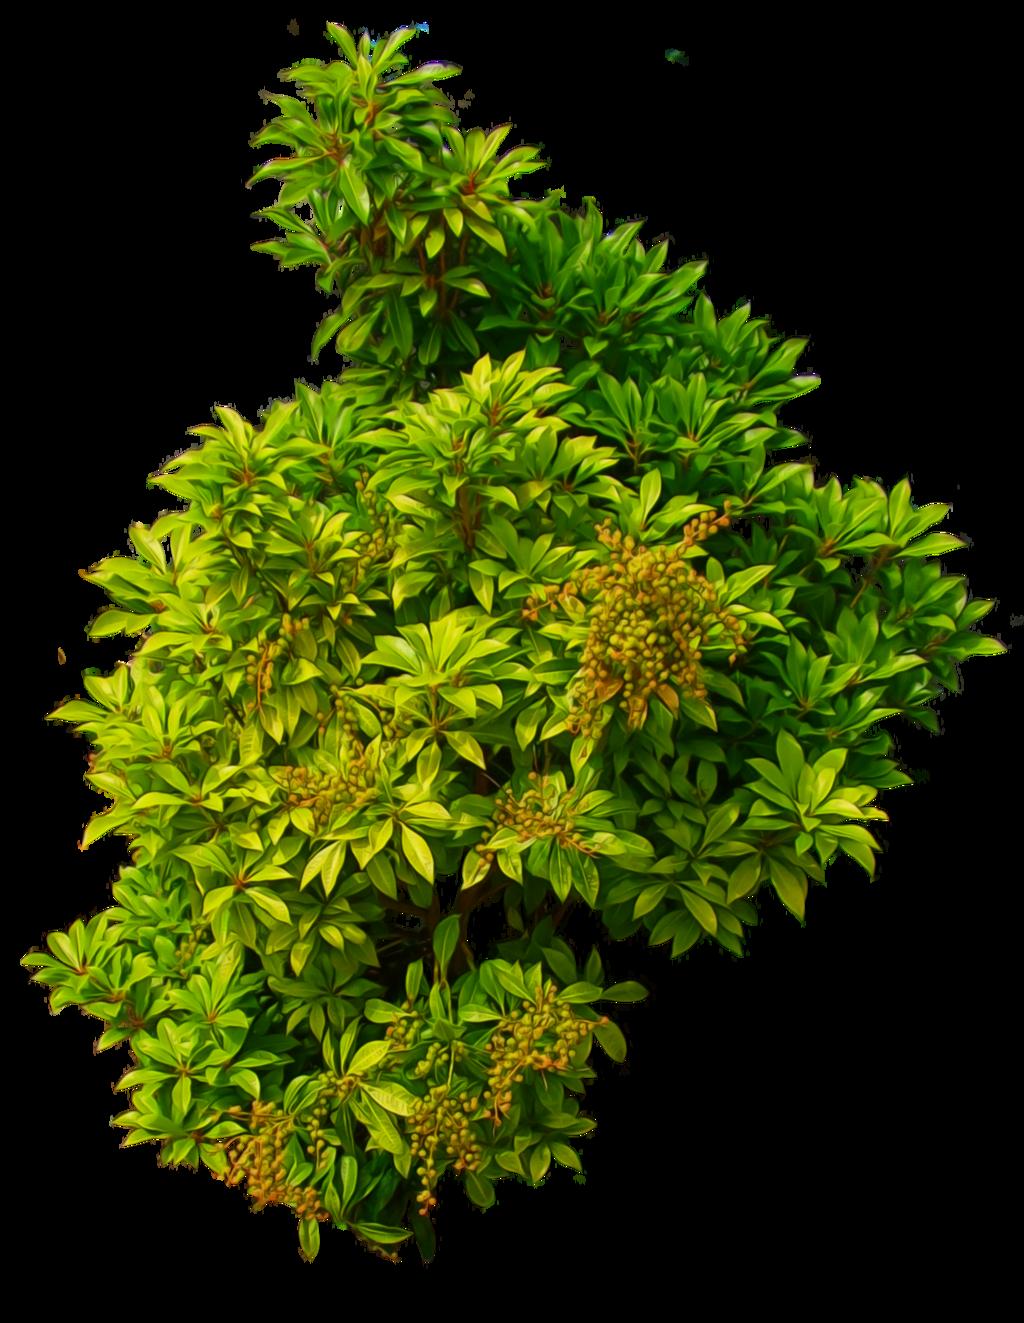 Pin by Bulun S. on green.